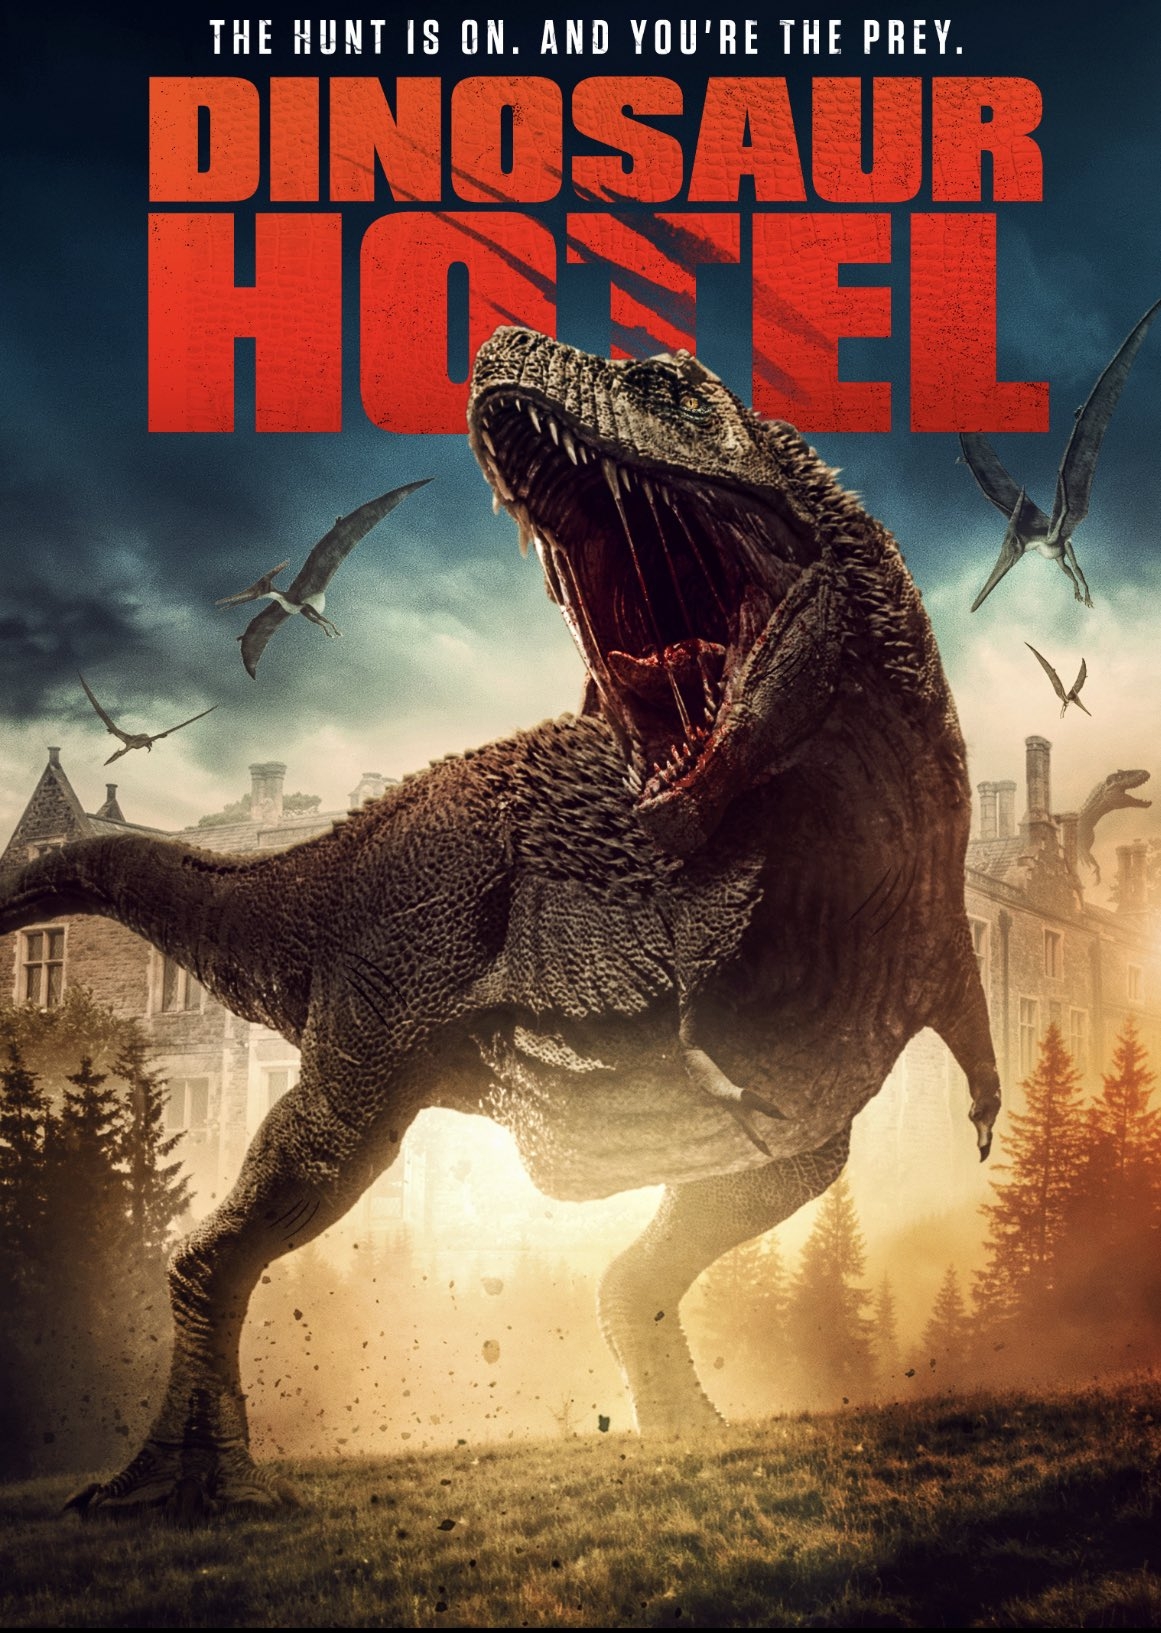 Dinosaur Hotel 2021 English 480p HDRip ESub 250MB Download